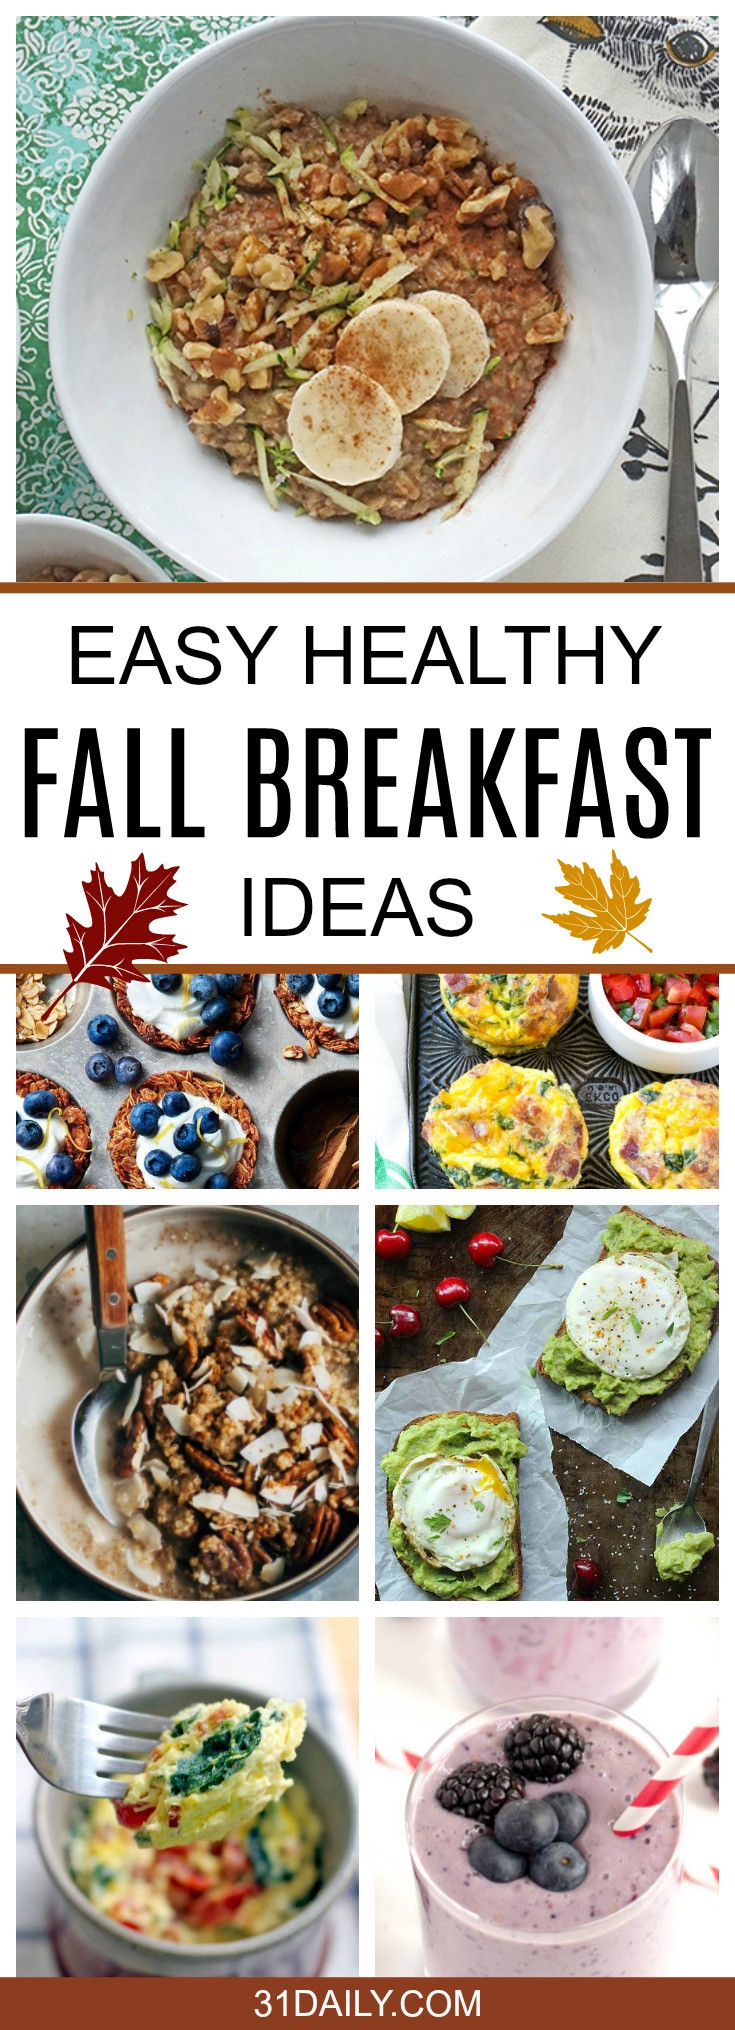 Healthy Fall Breakfast Recipes  Easy and Healthy Fall Breakfast Ideas 31 Daily